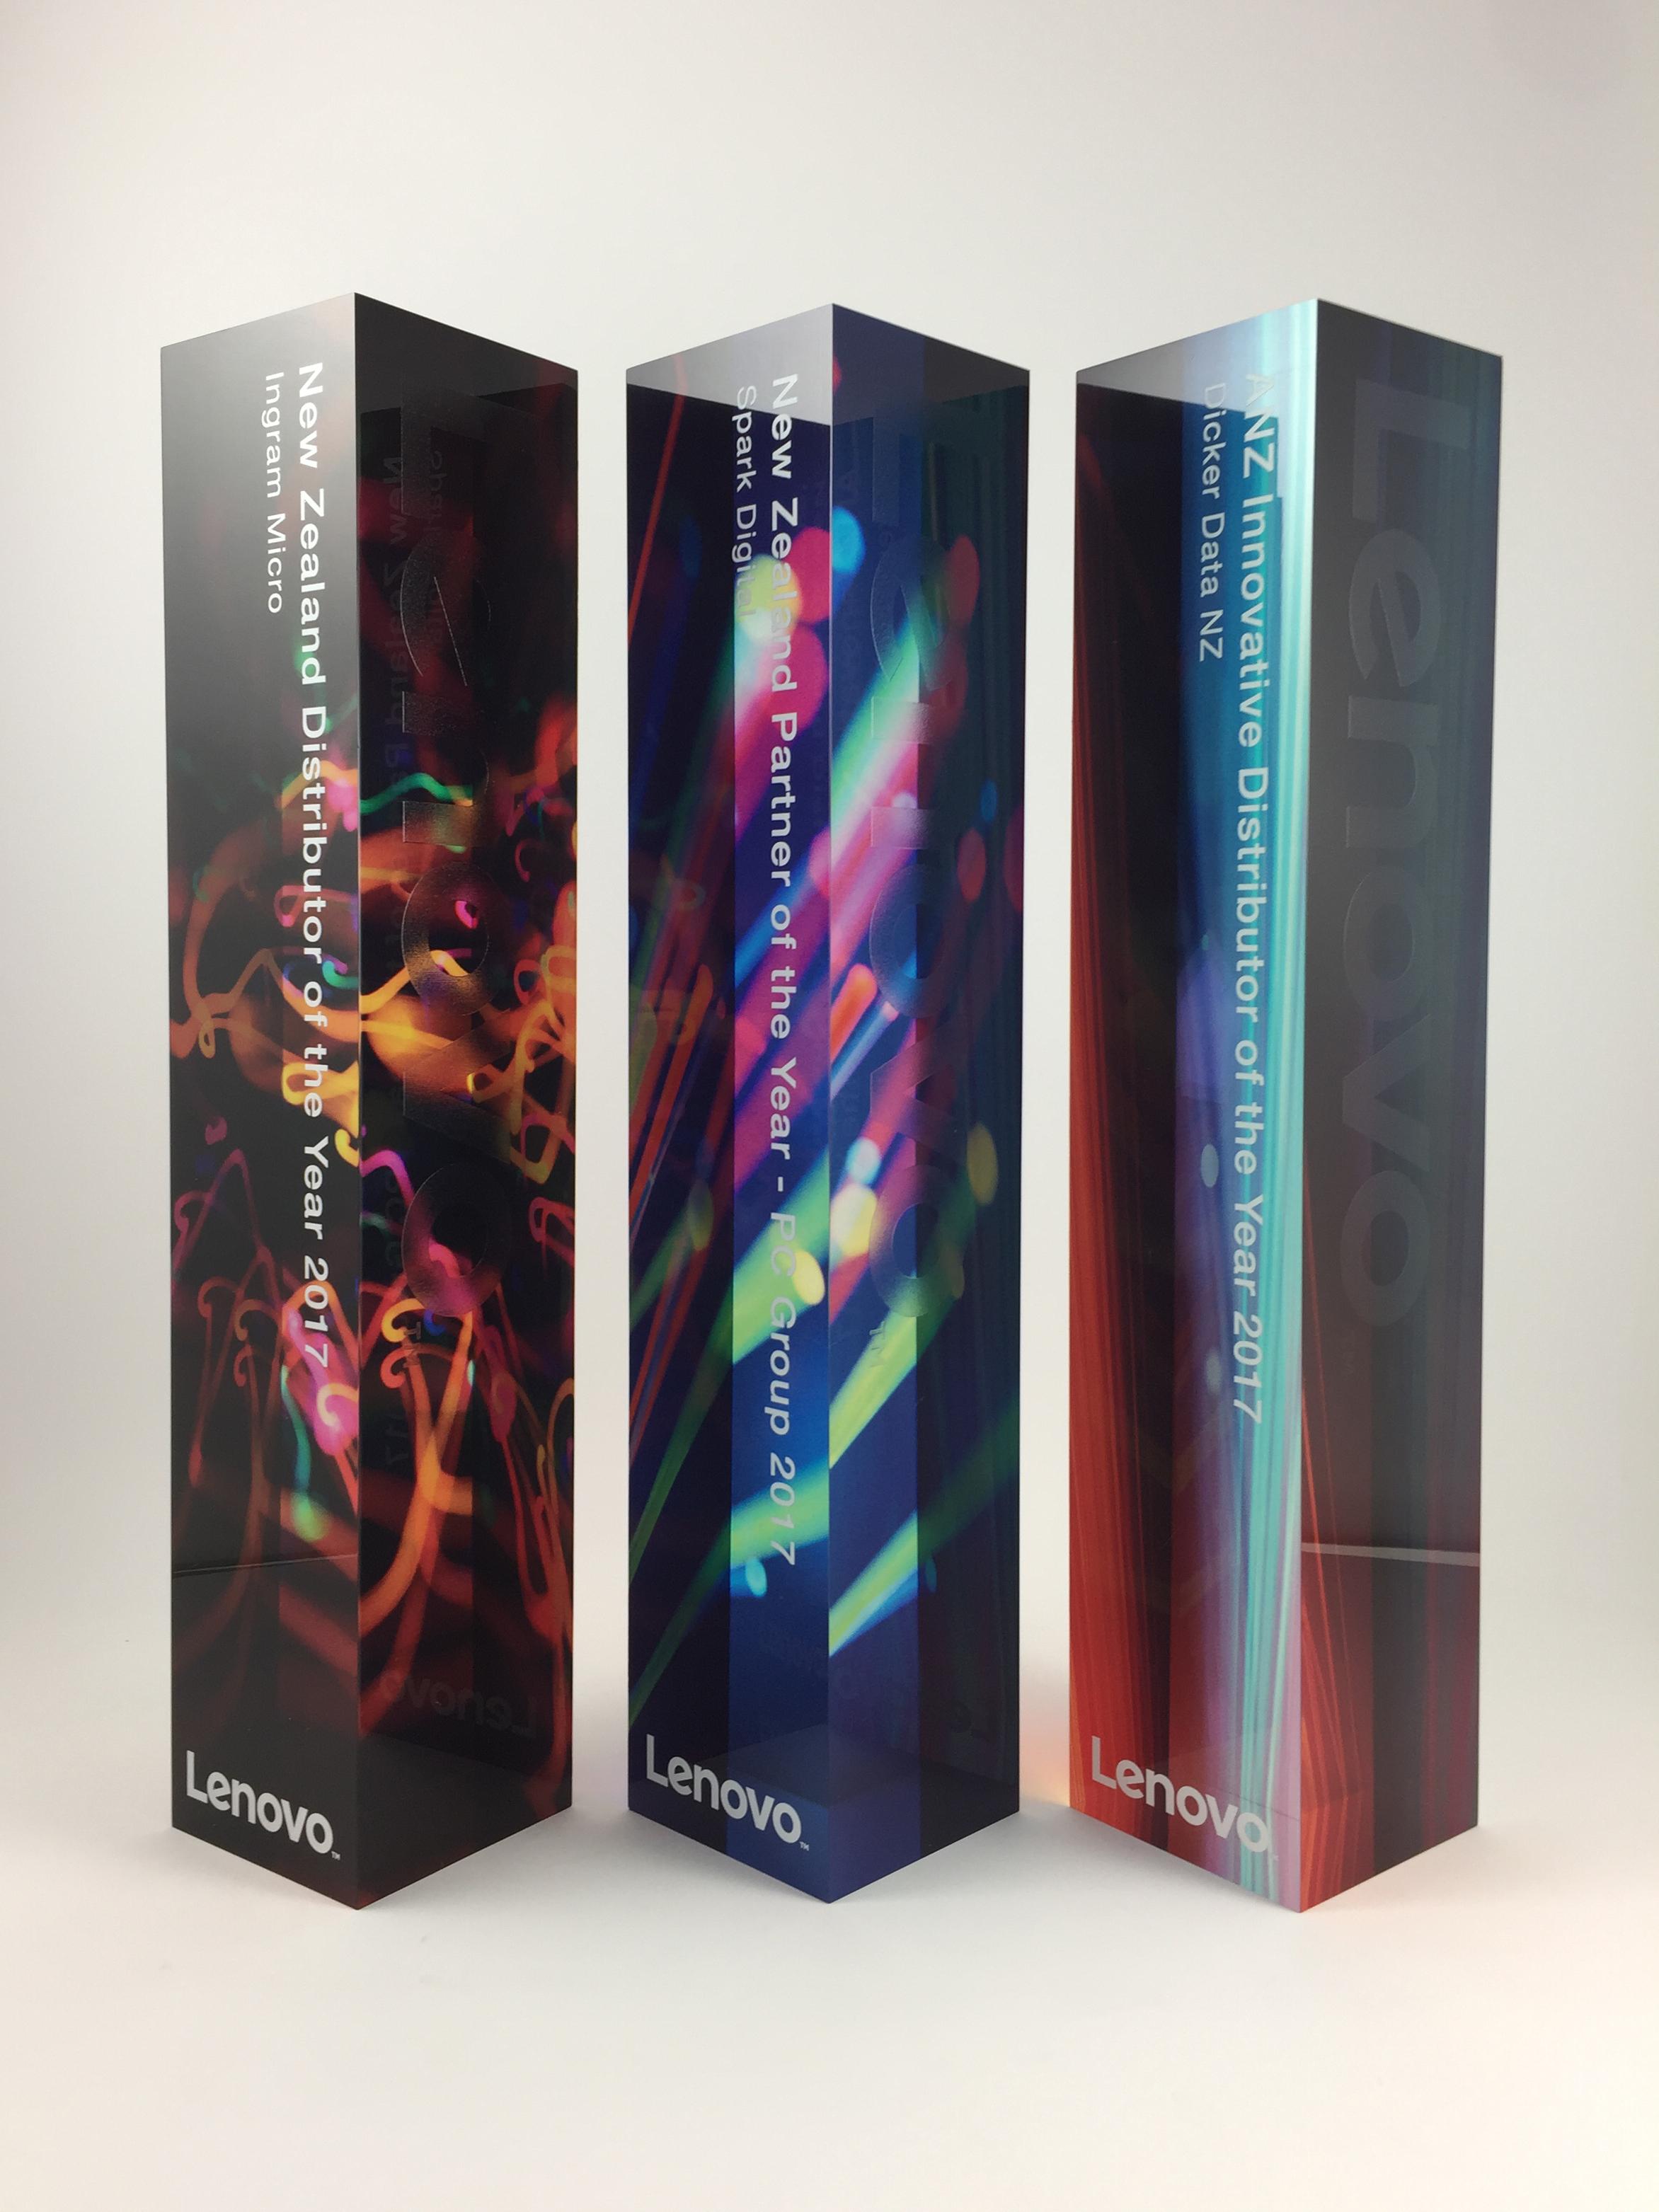 Lenovo-acrylic-trophy-awards-02.jpg